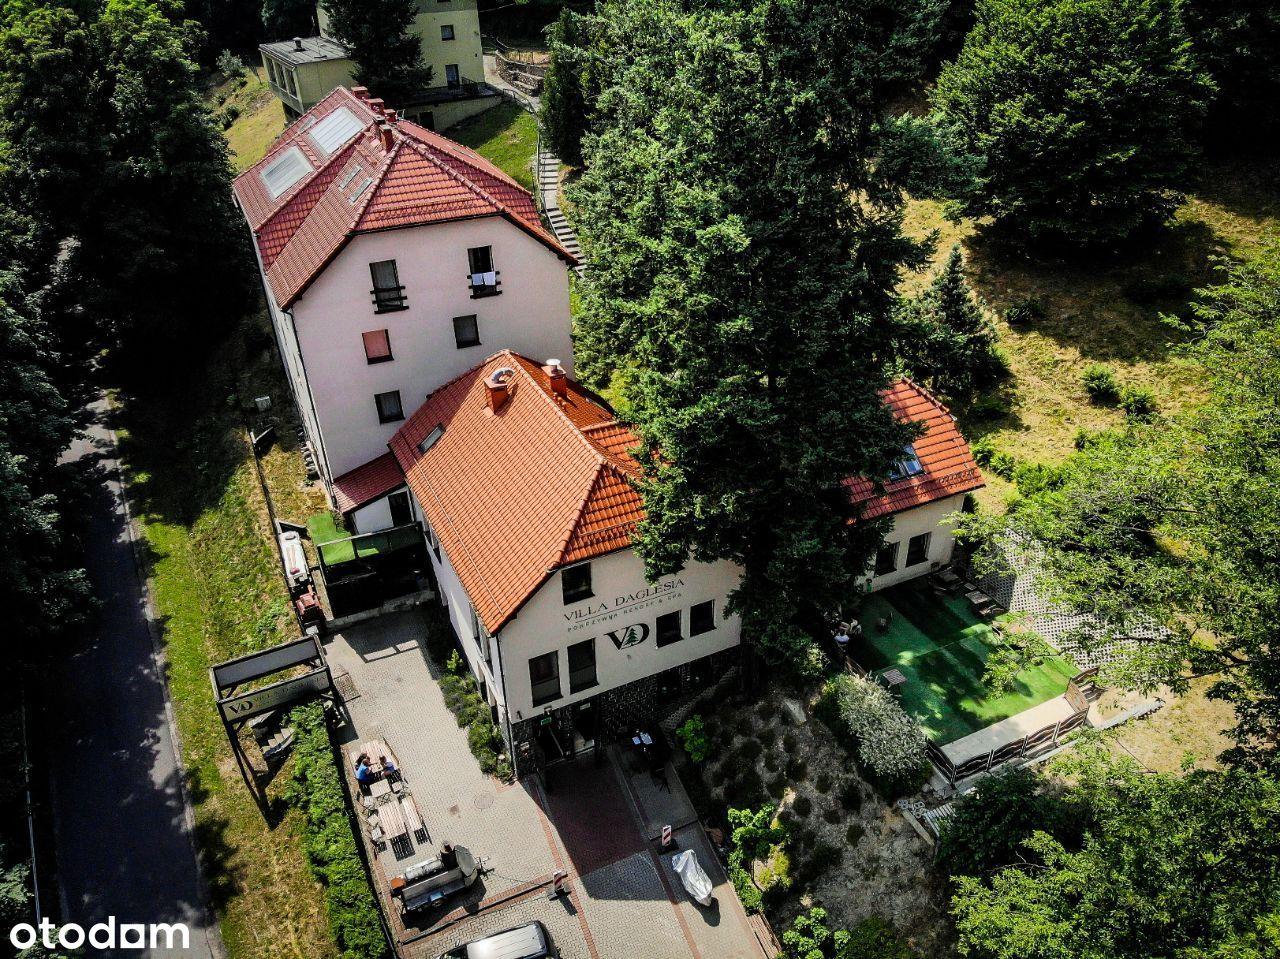 Hotel Villa Daglesia - Woj. Opolskie Sudety